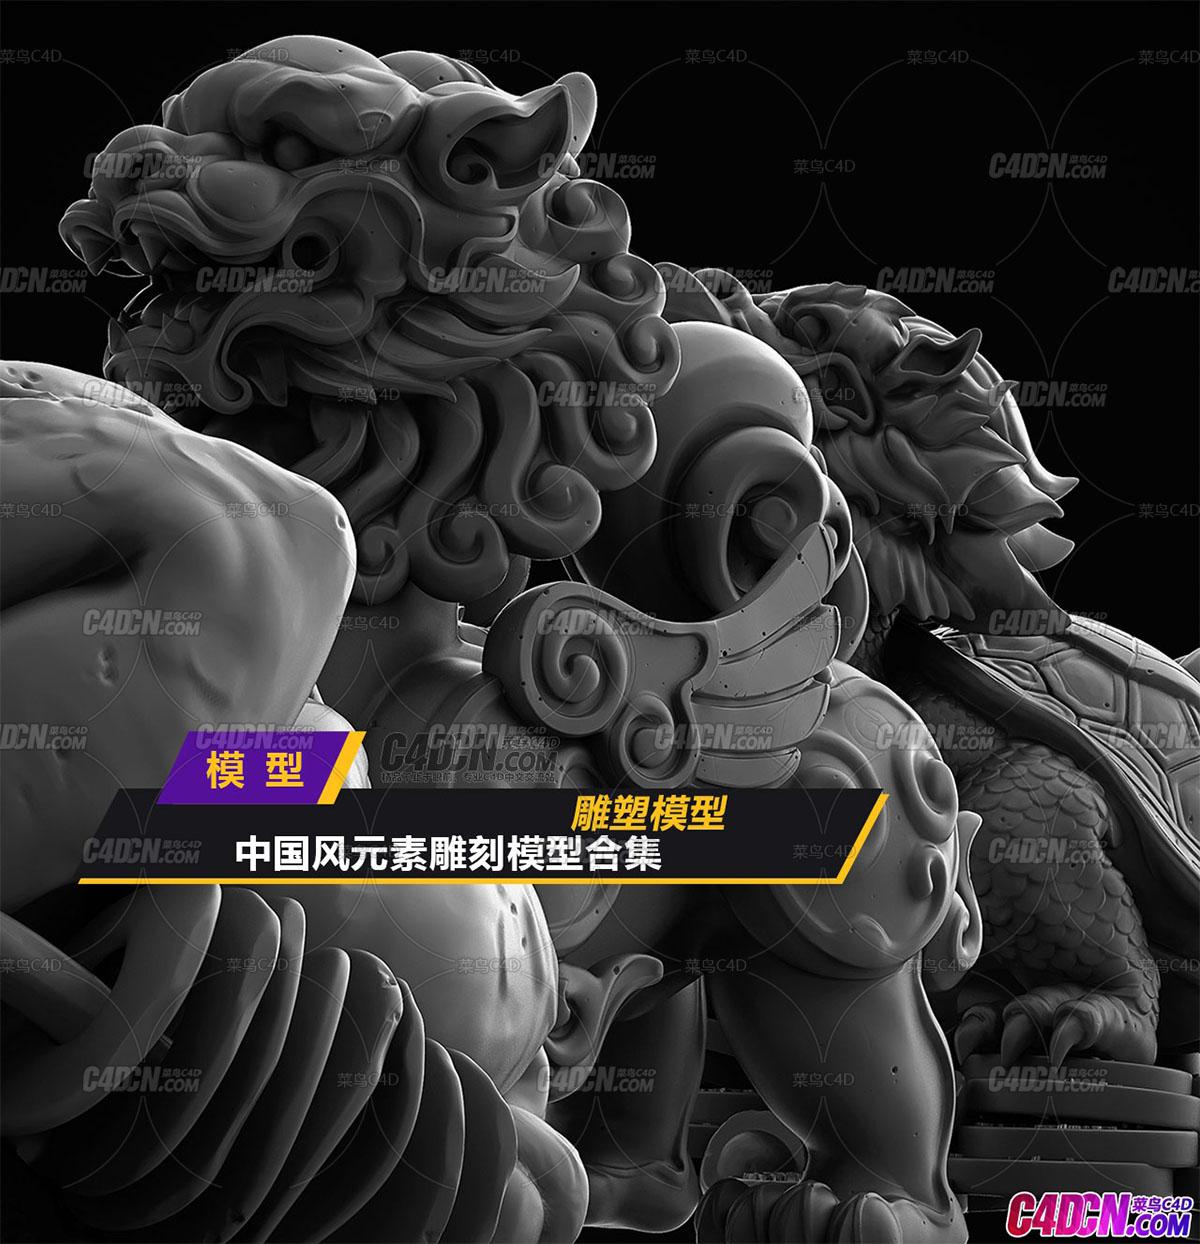 China_simvol_dog.jpg